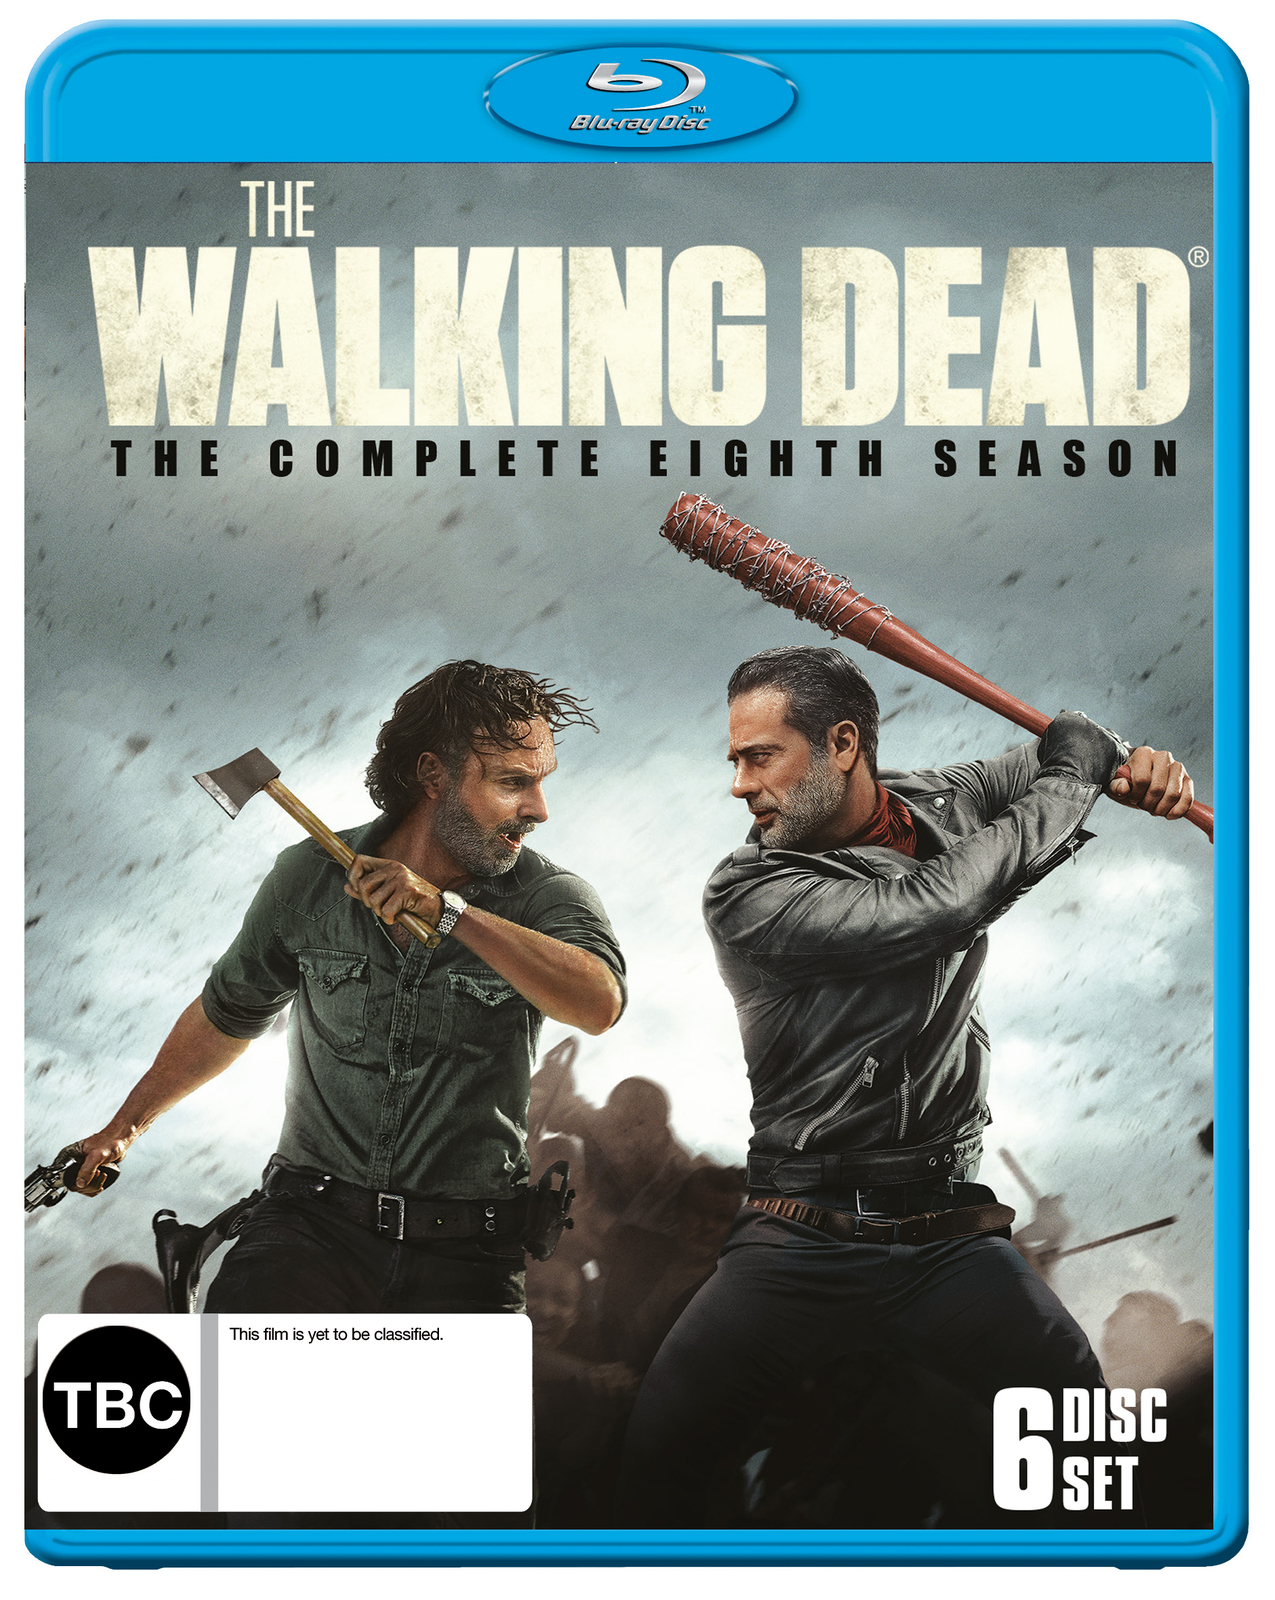 The Walking Dead: Season 8 on Blu-ray image